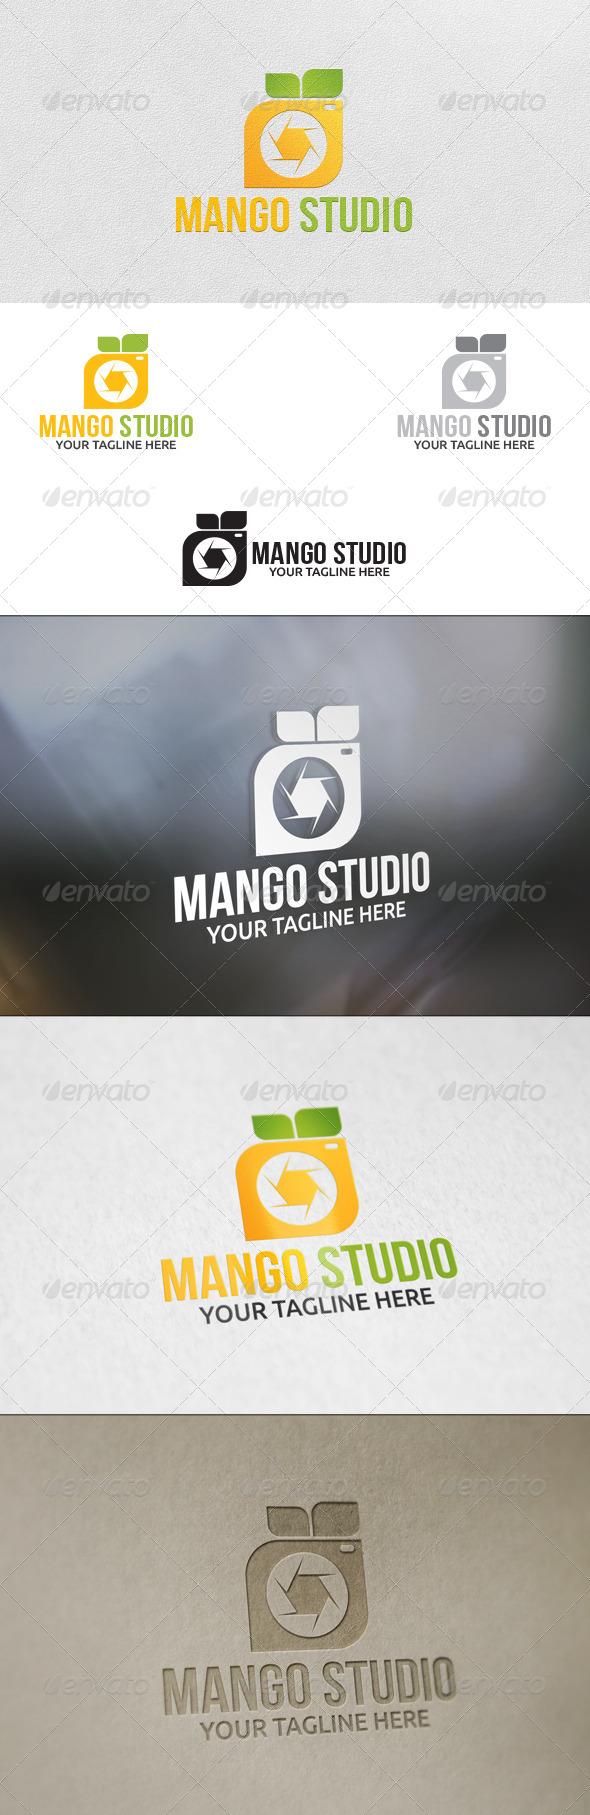 GraphicRiver Mango Studio Logo Template 5922838